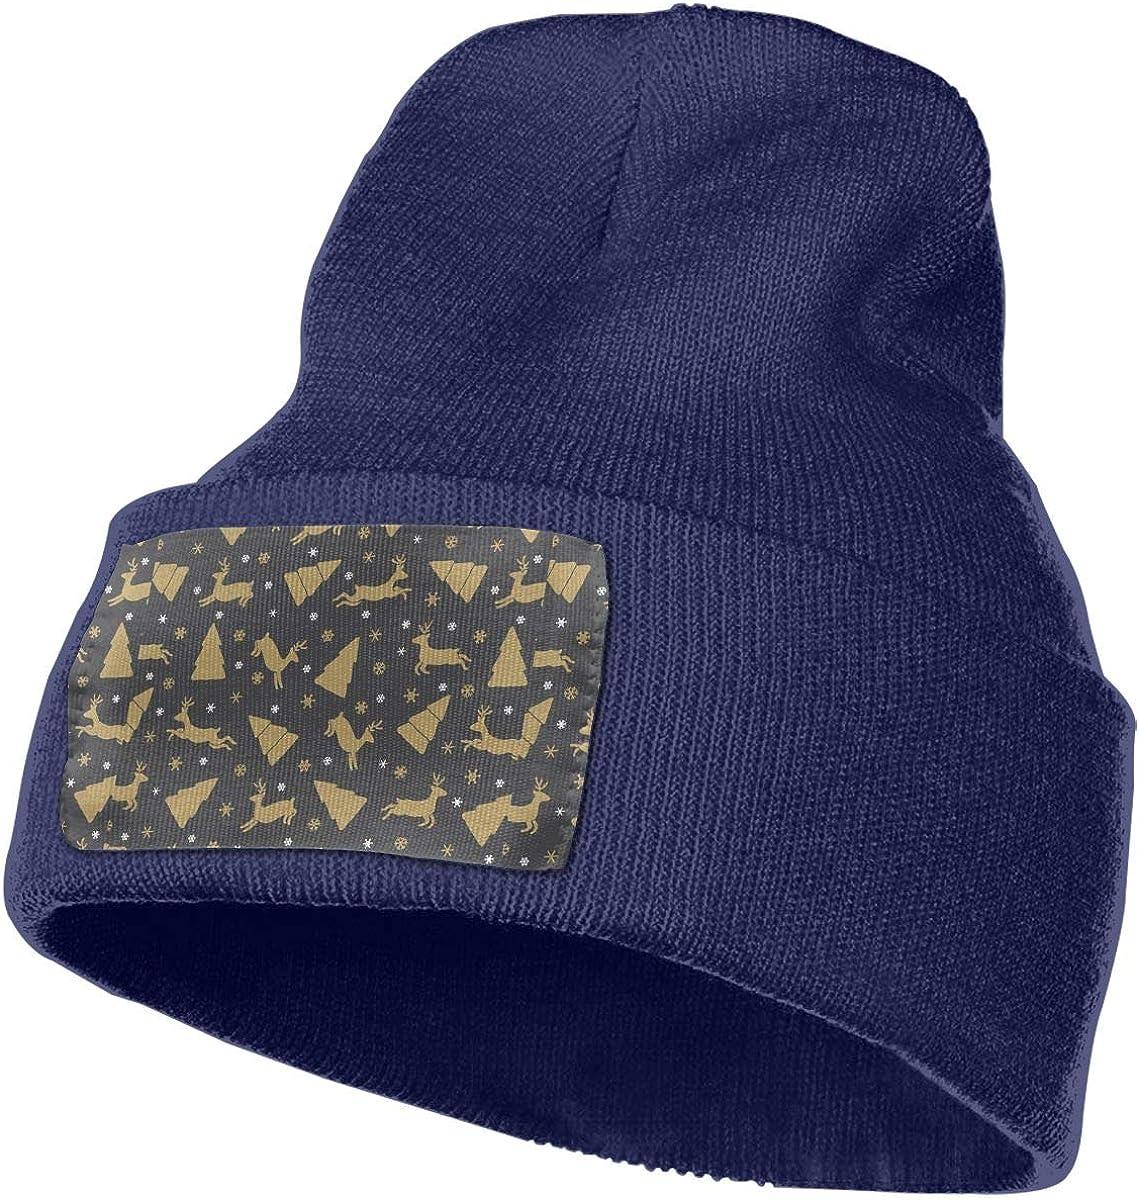 PCaag7v Deer Colorful Christmas Beanie Hat Winter Solid Warm Knit Unisex Ski Skull Cap